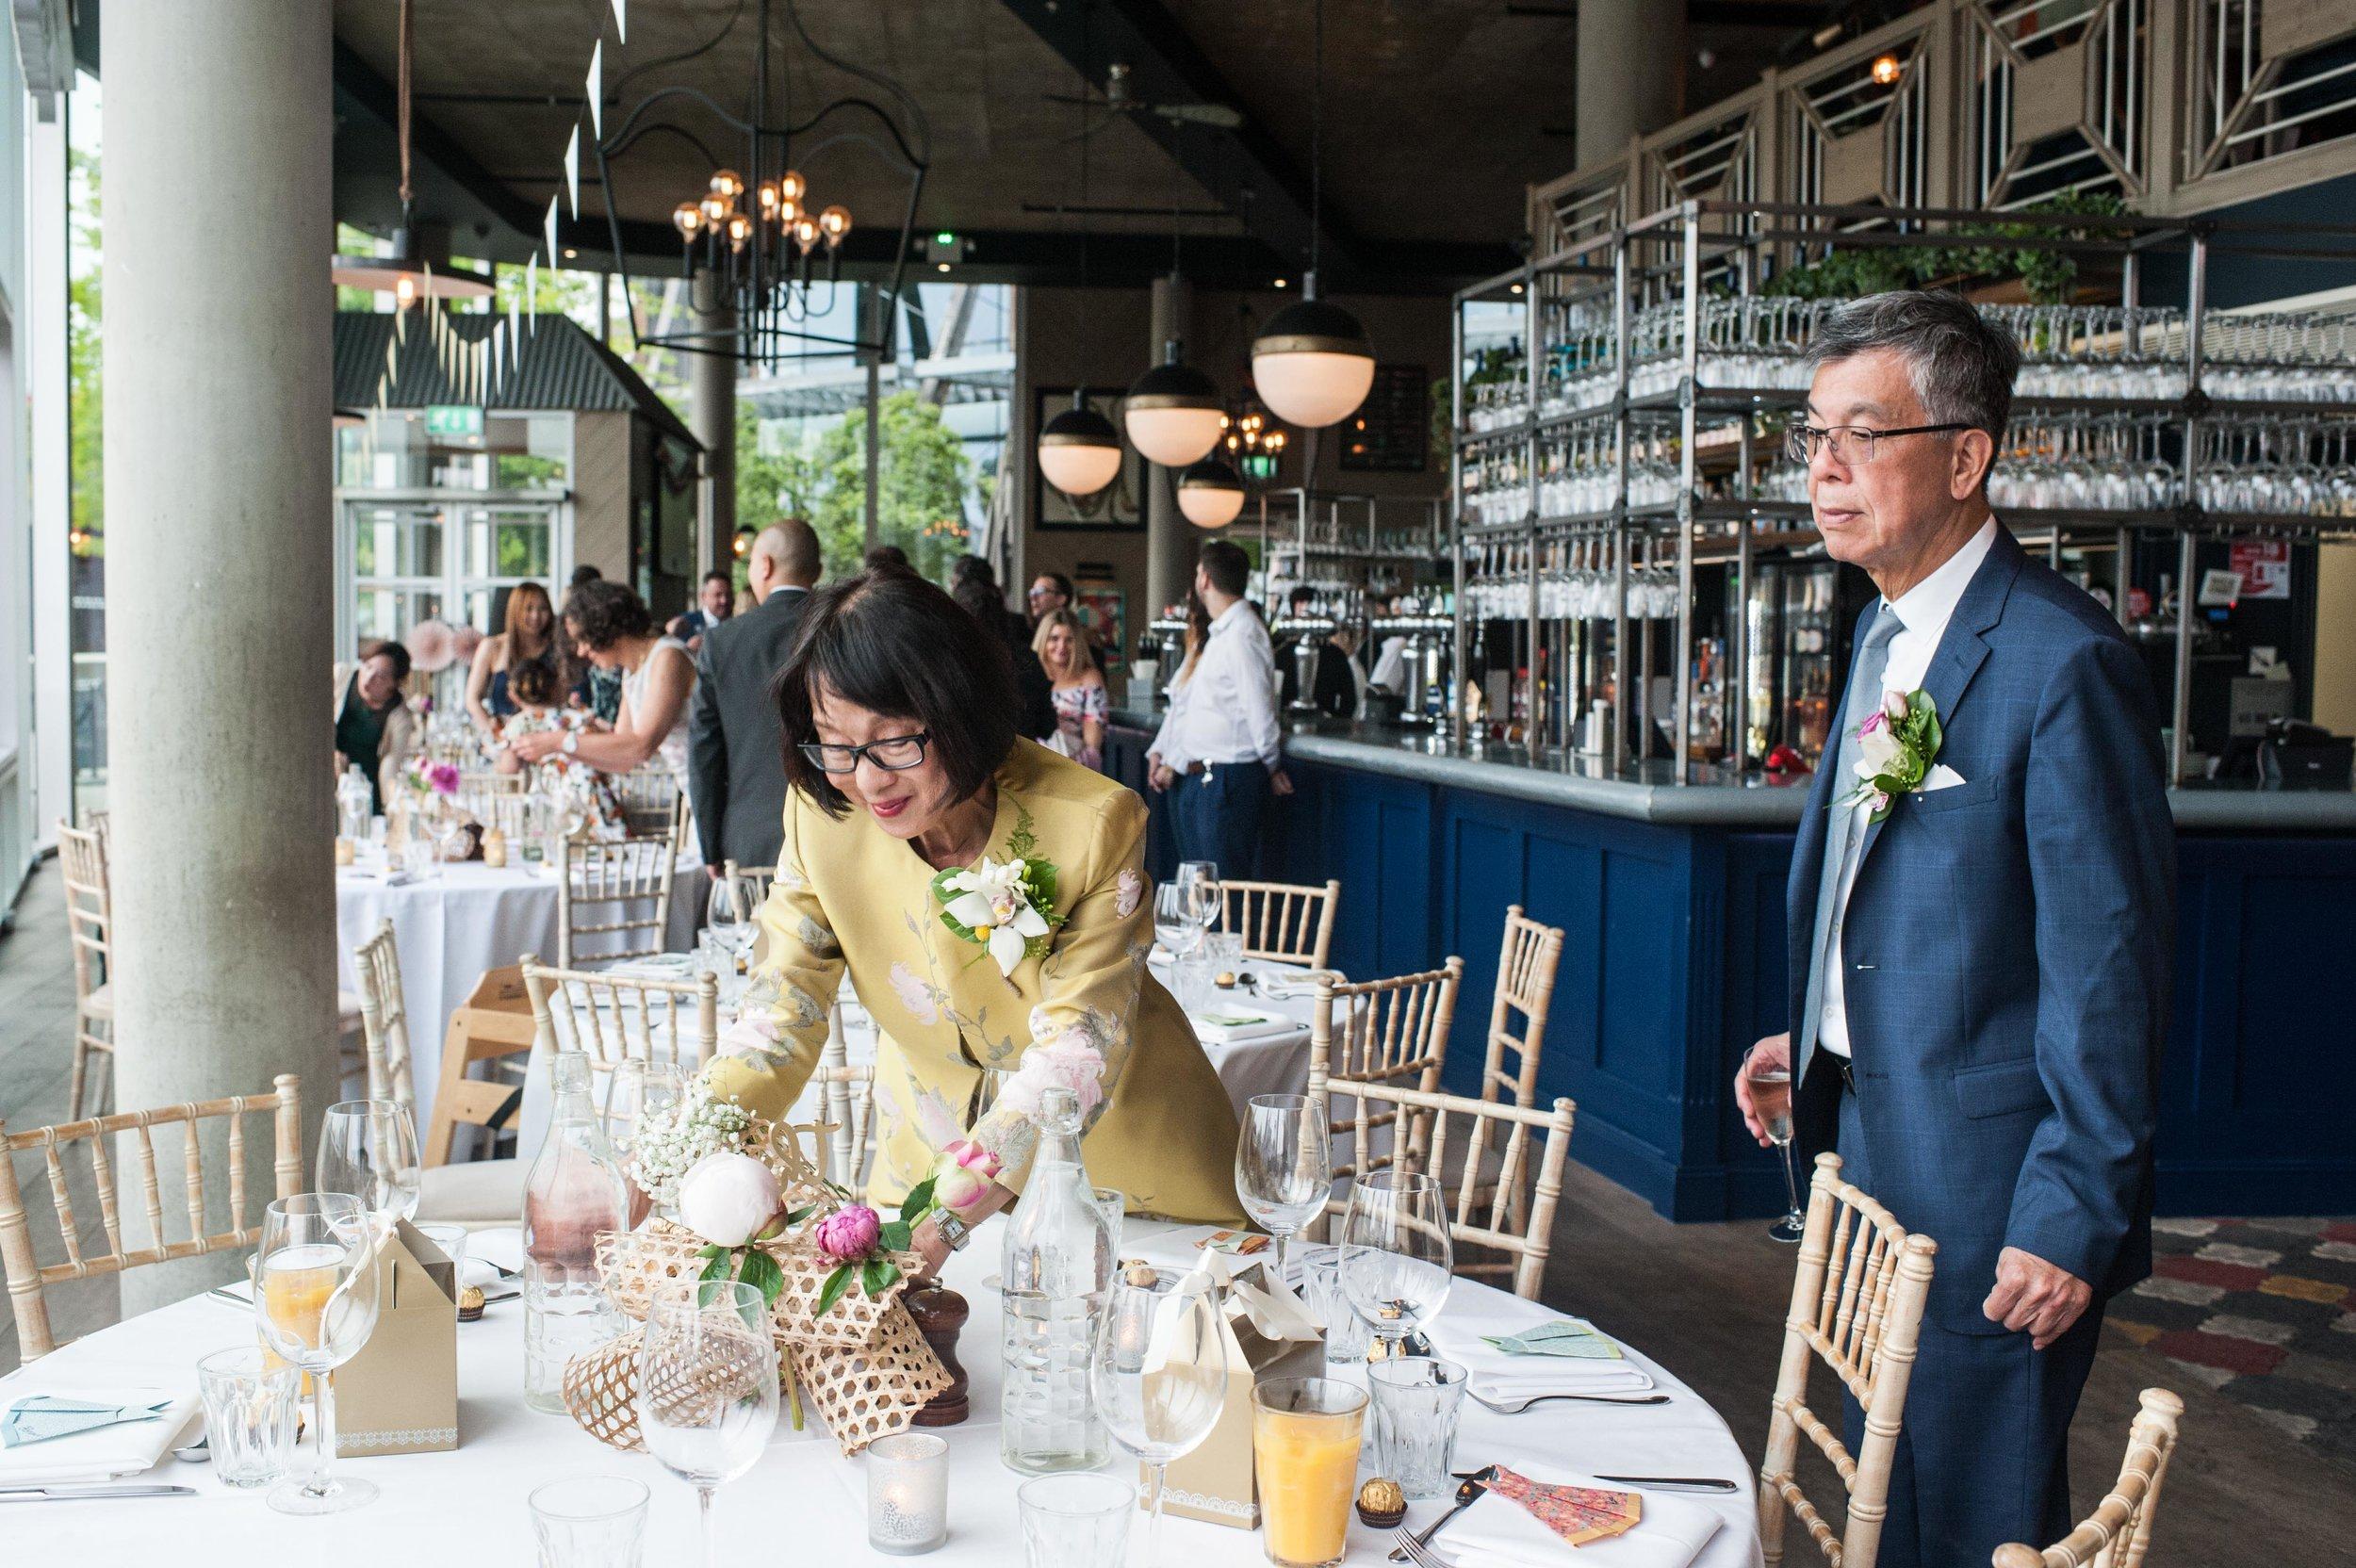 D&M_Marylebone Town Hall Wedding (197 of 239).jpg